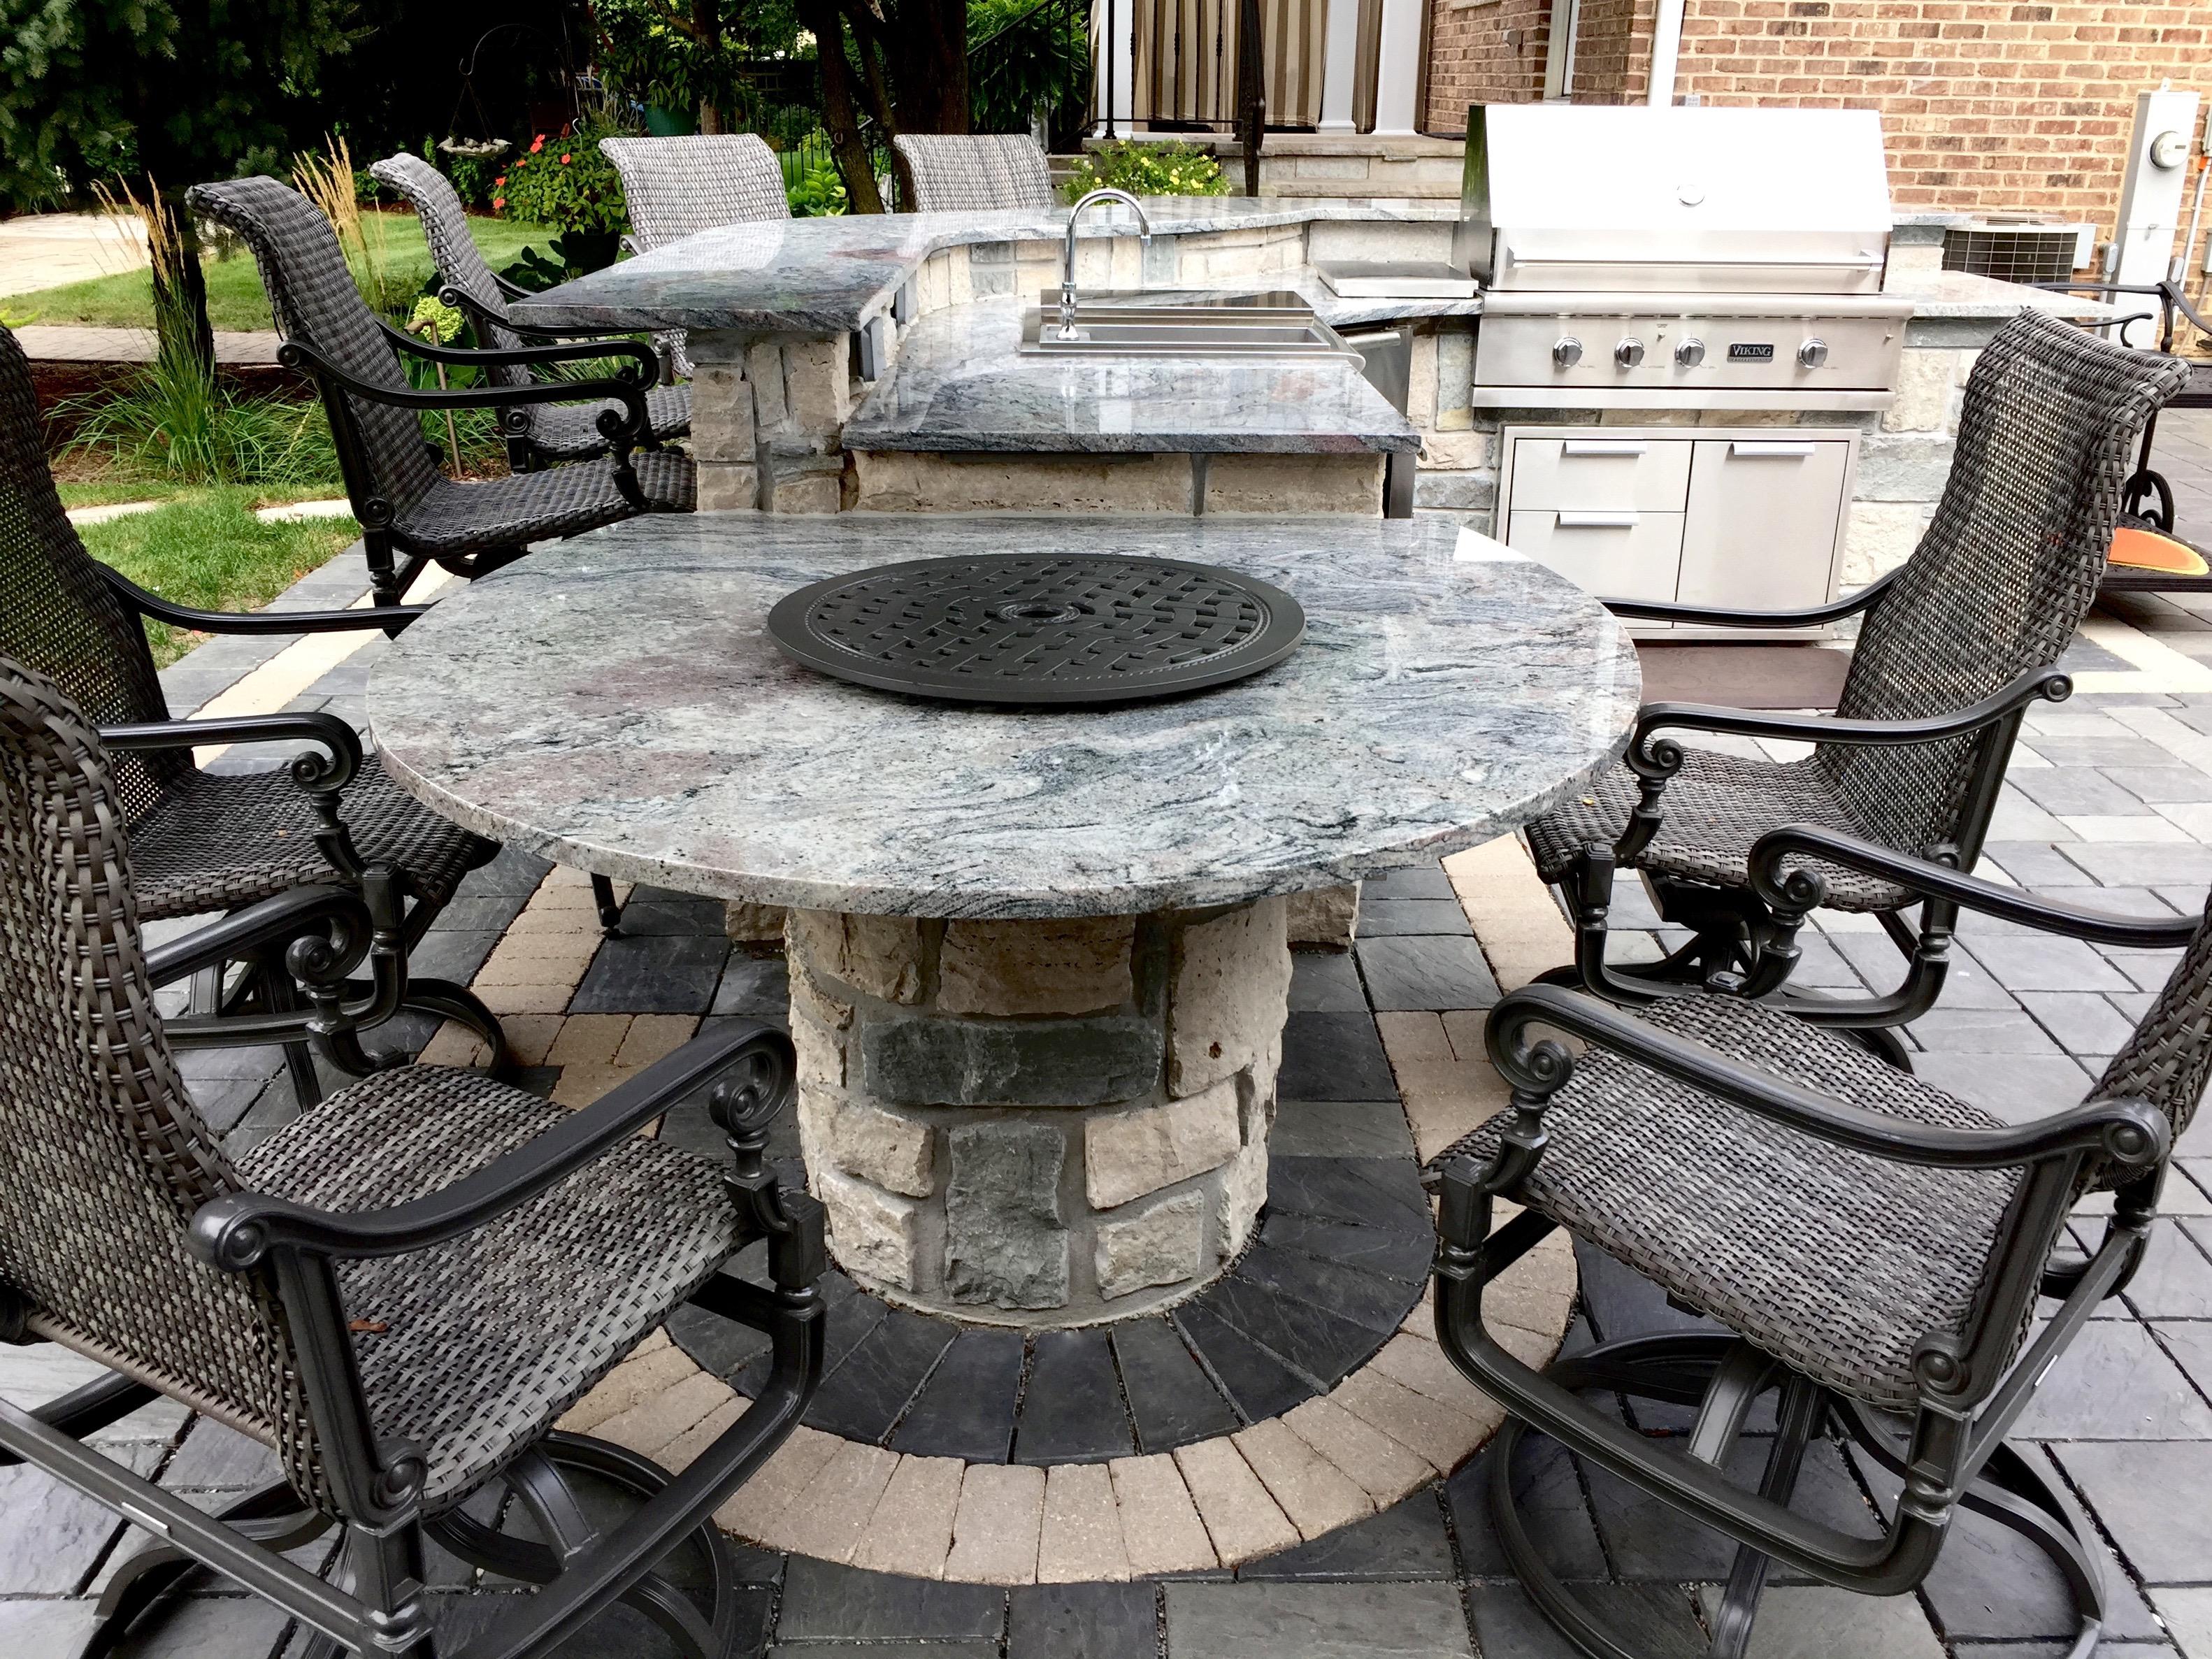 Naperville Masonry Natural Stone Outdoor Kitchen  Masonry Natural Stone Bar With Granite Countertop